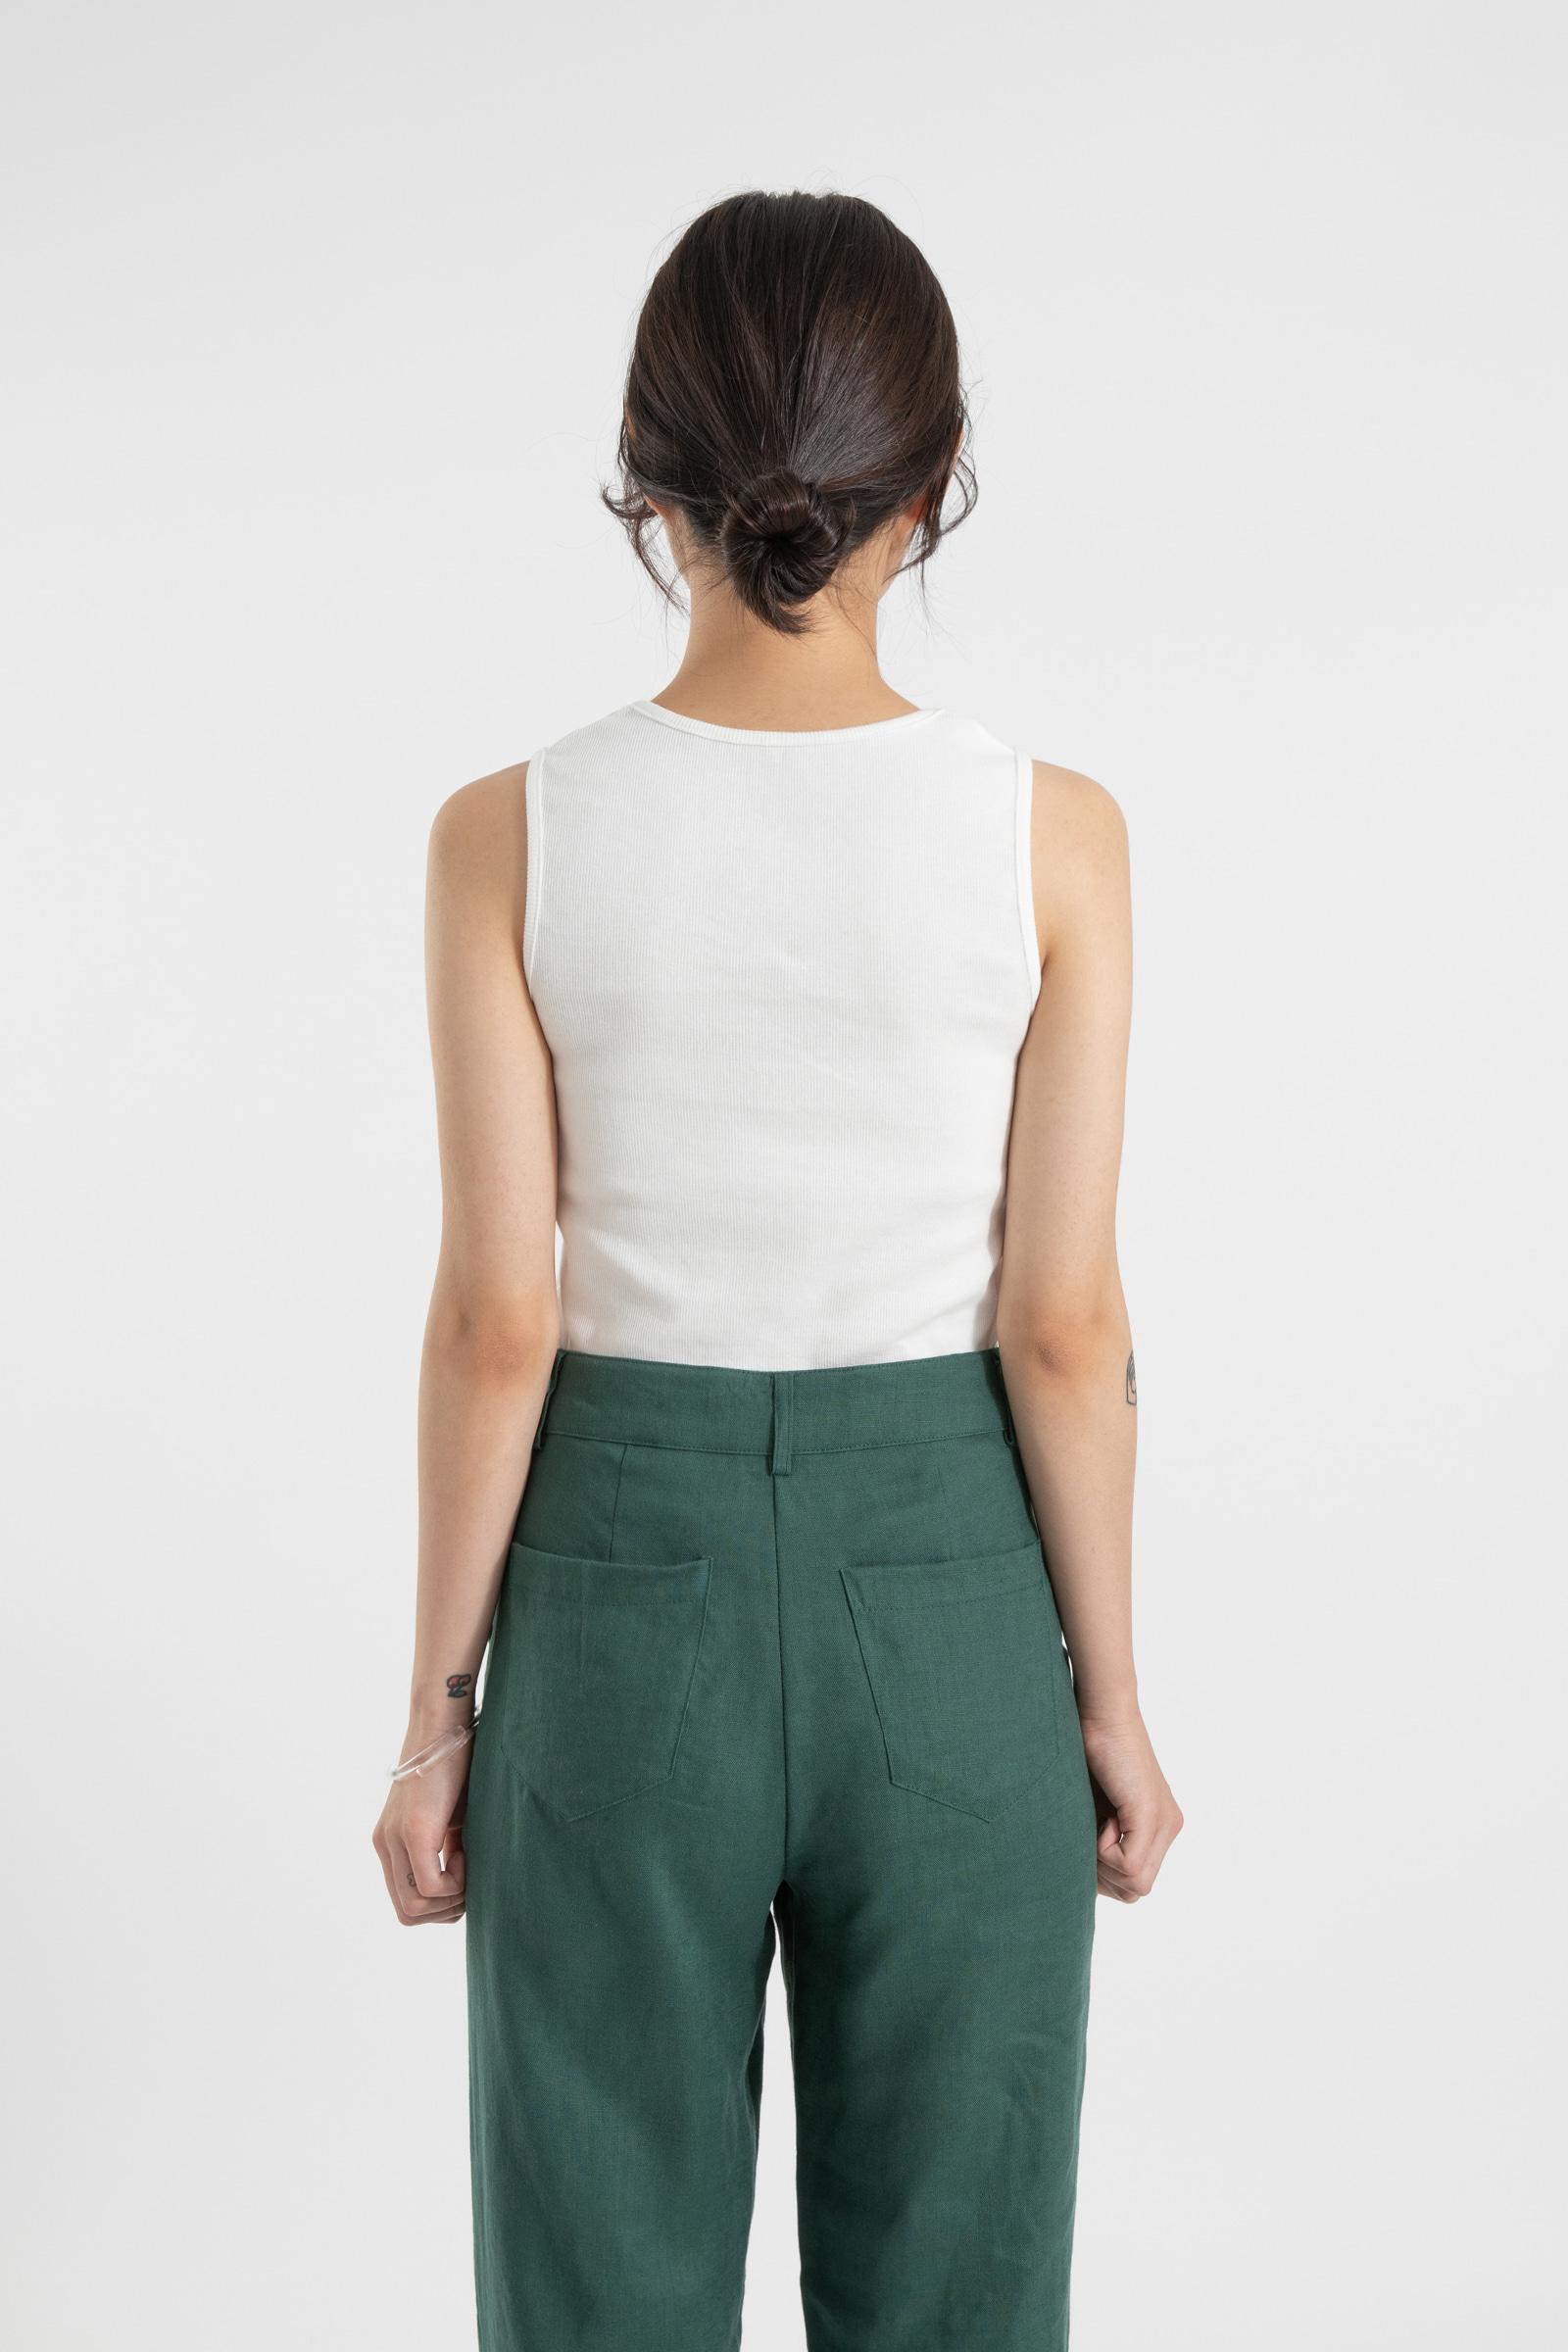 Ribbed line sleeveless top